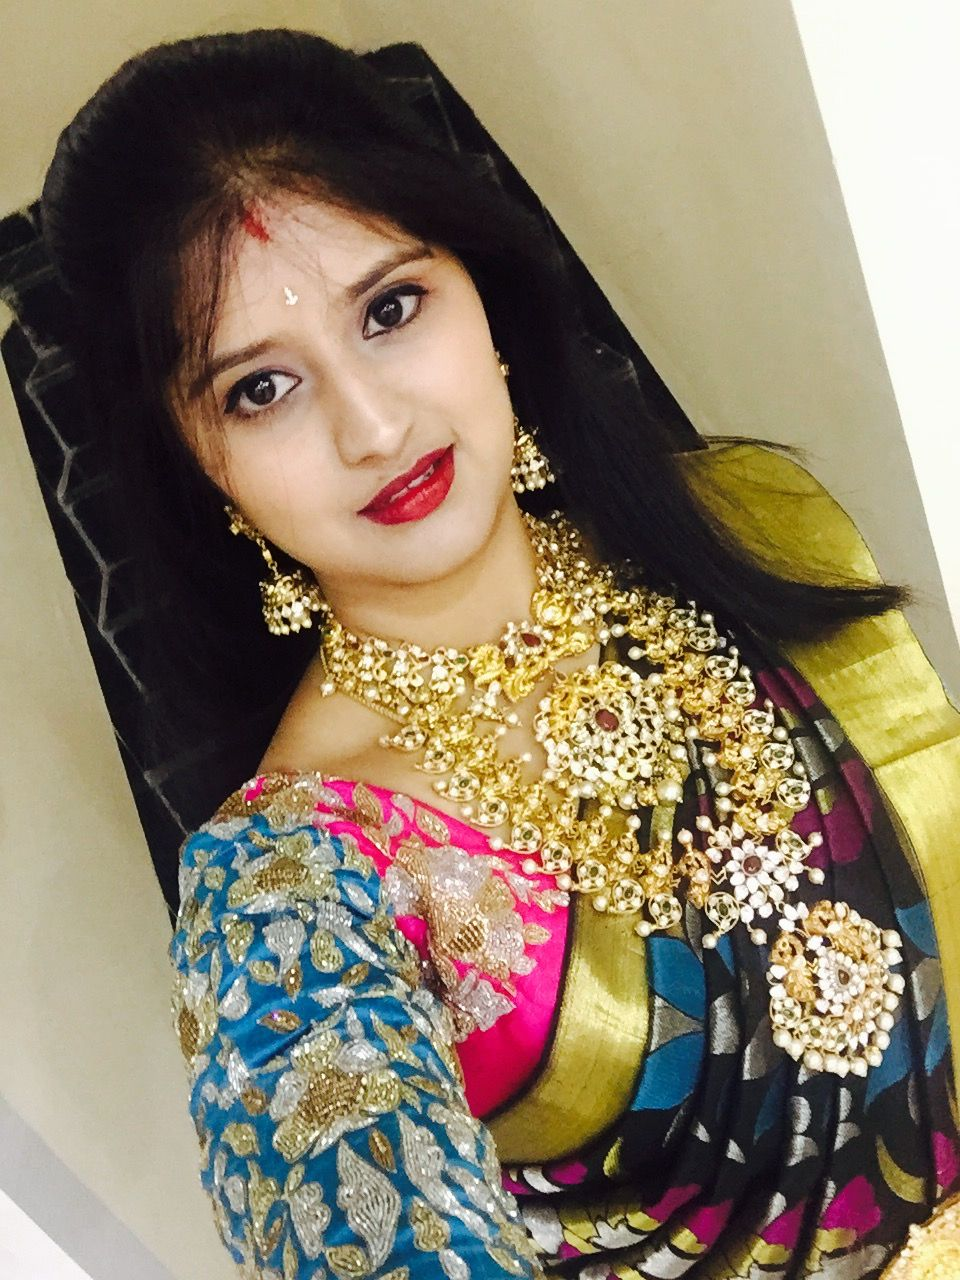 Saree jewellery images aish induri in heavy polki jewellery in black kanchipuram saree